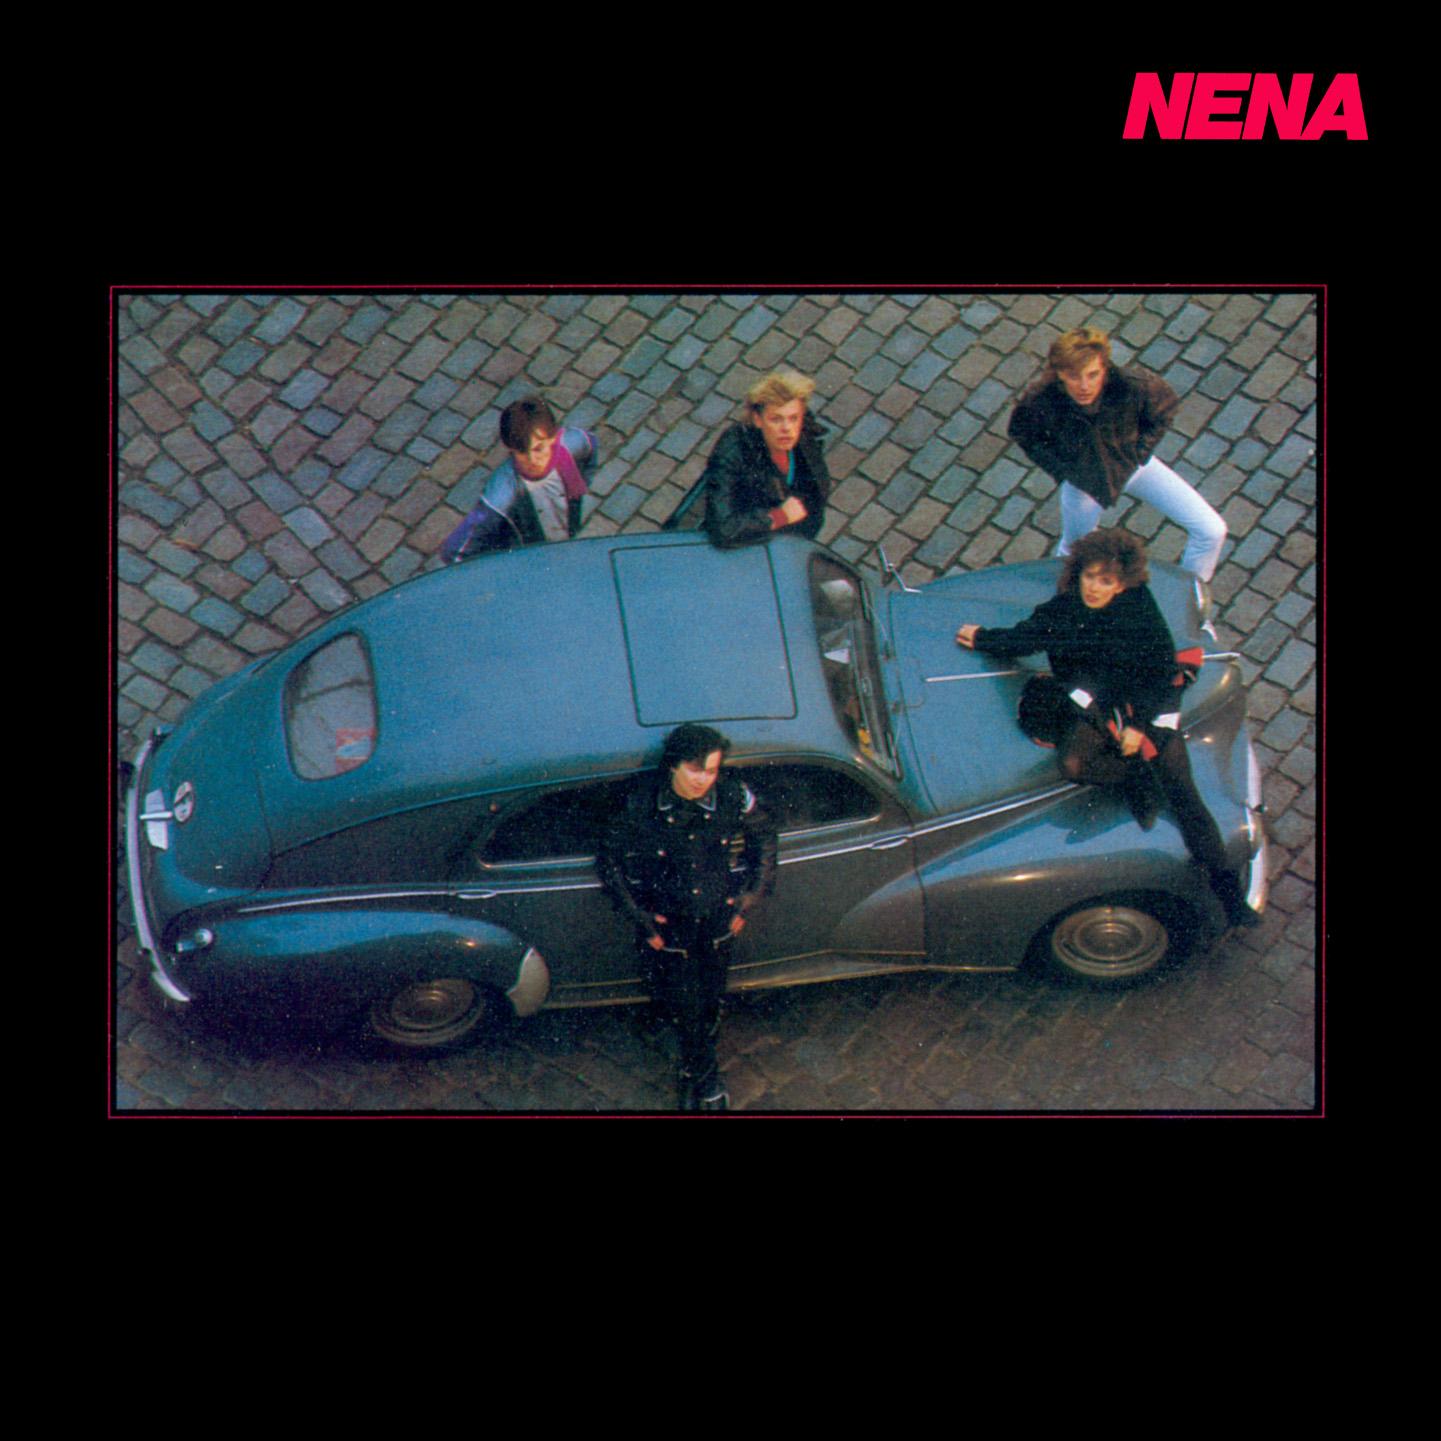 Leuchtturm - Nena (1983)